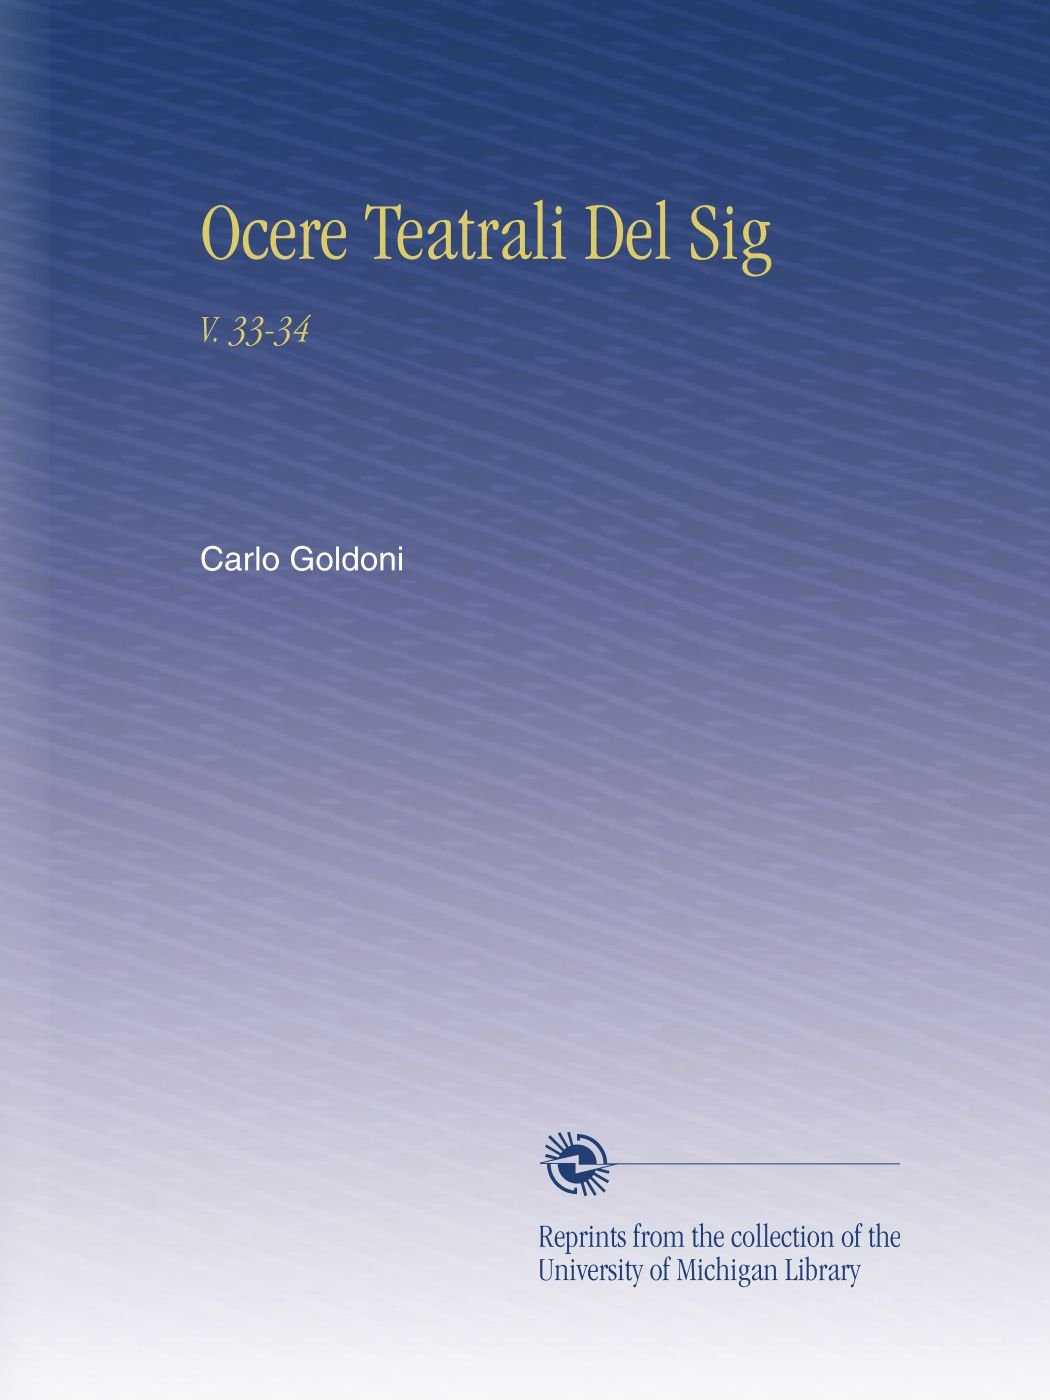 Download Ocere Teatrali Del Sig: V. 33-34 (Italian Edition) PDF